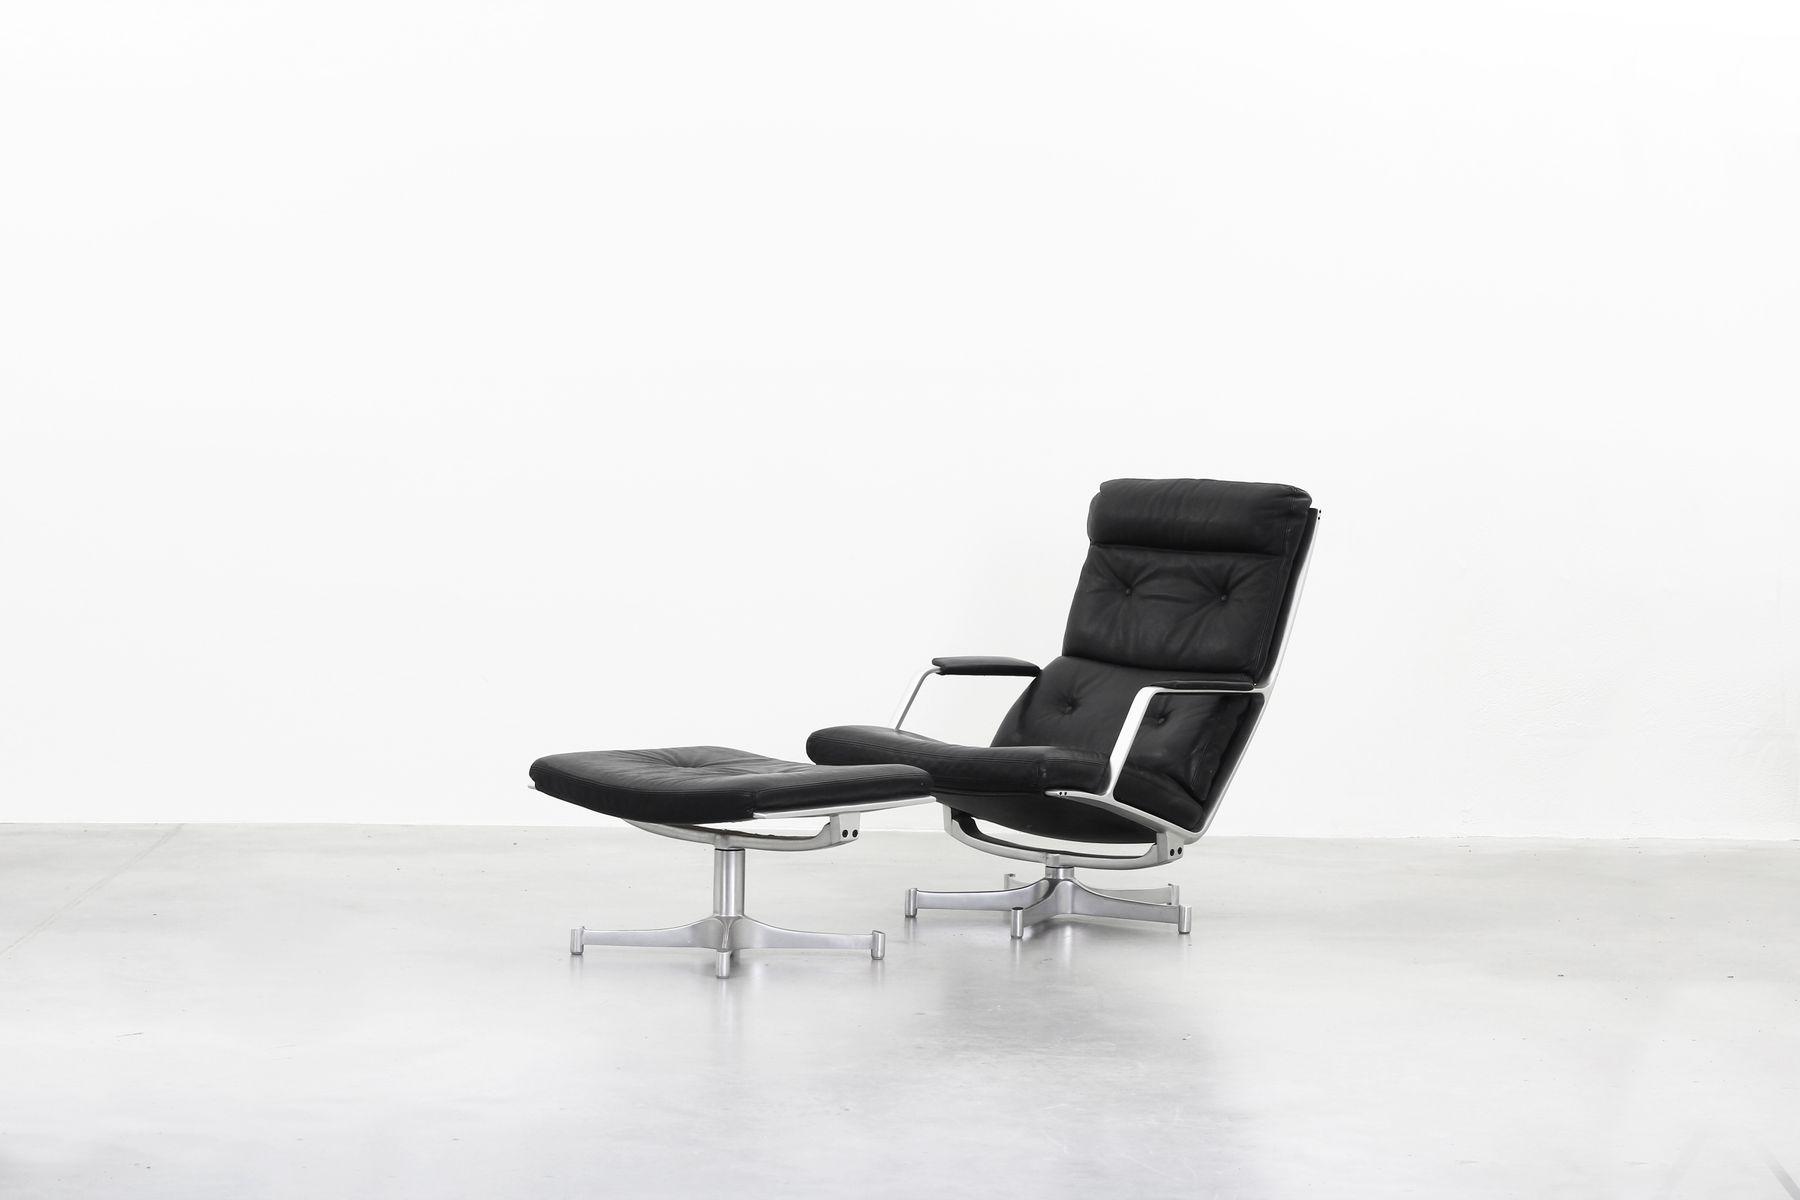 FK85 Lounge Chair U0026 Ottoman Set By Fabricius U0026 Kastholm For Kill  International, 1968